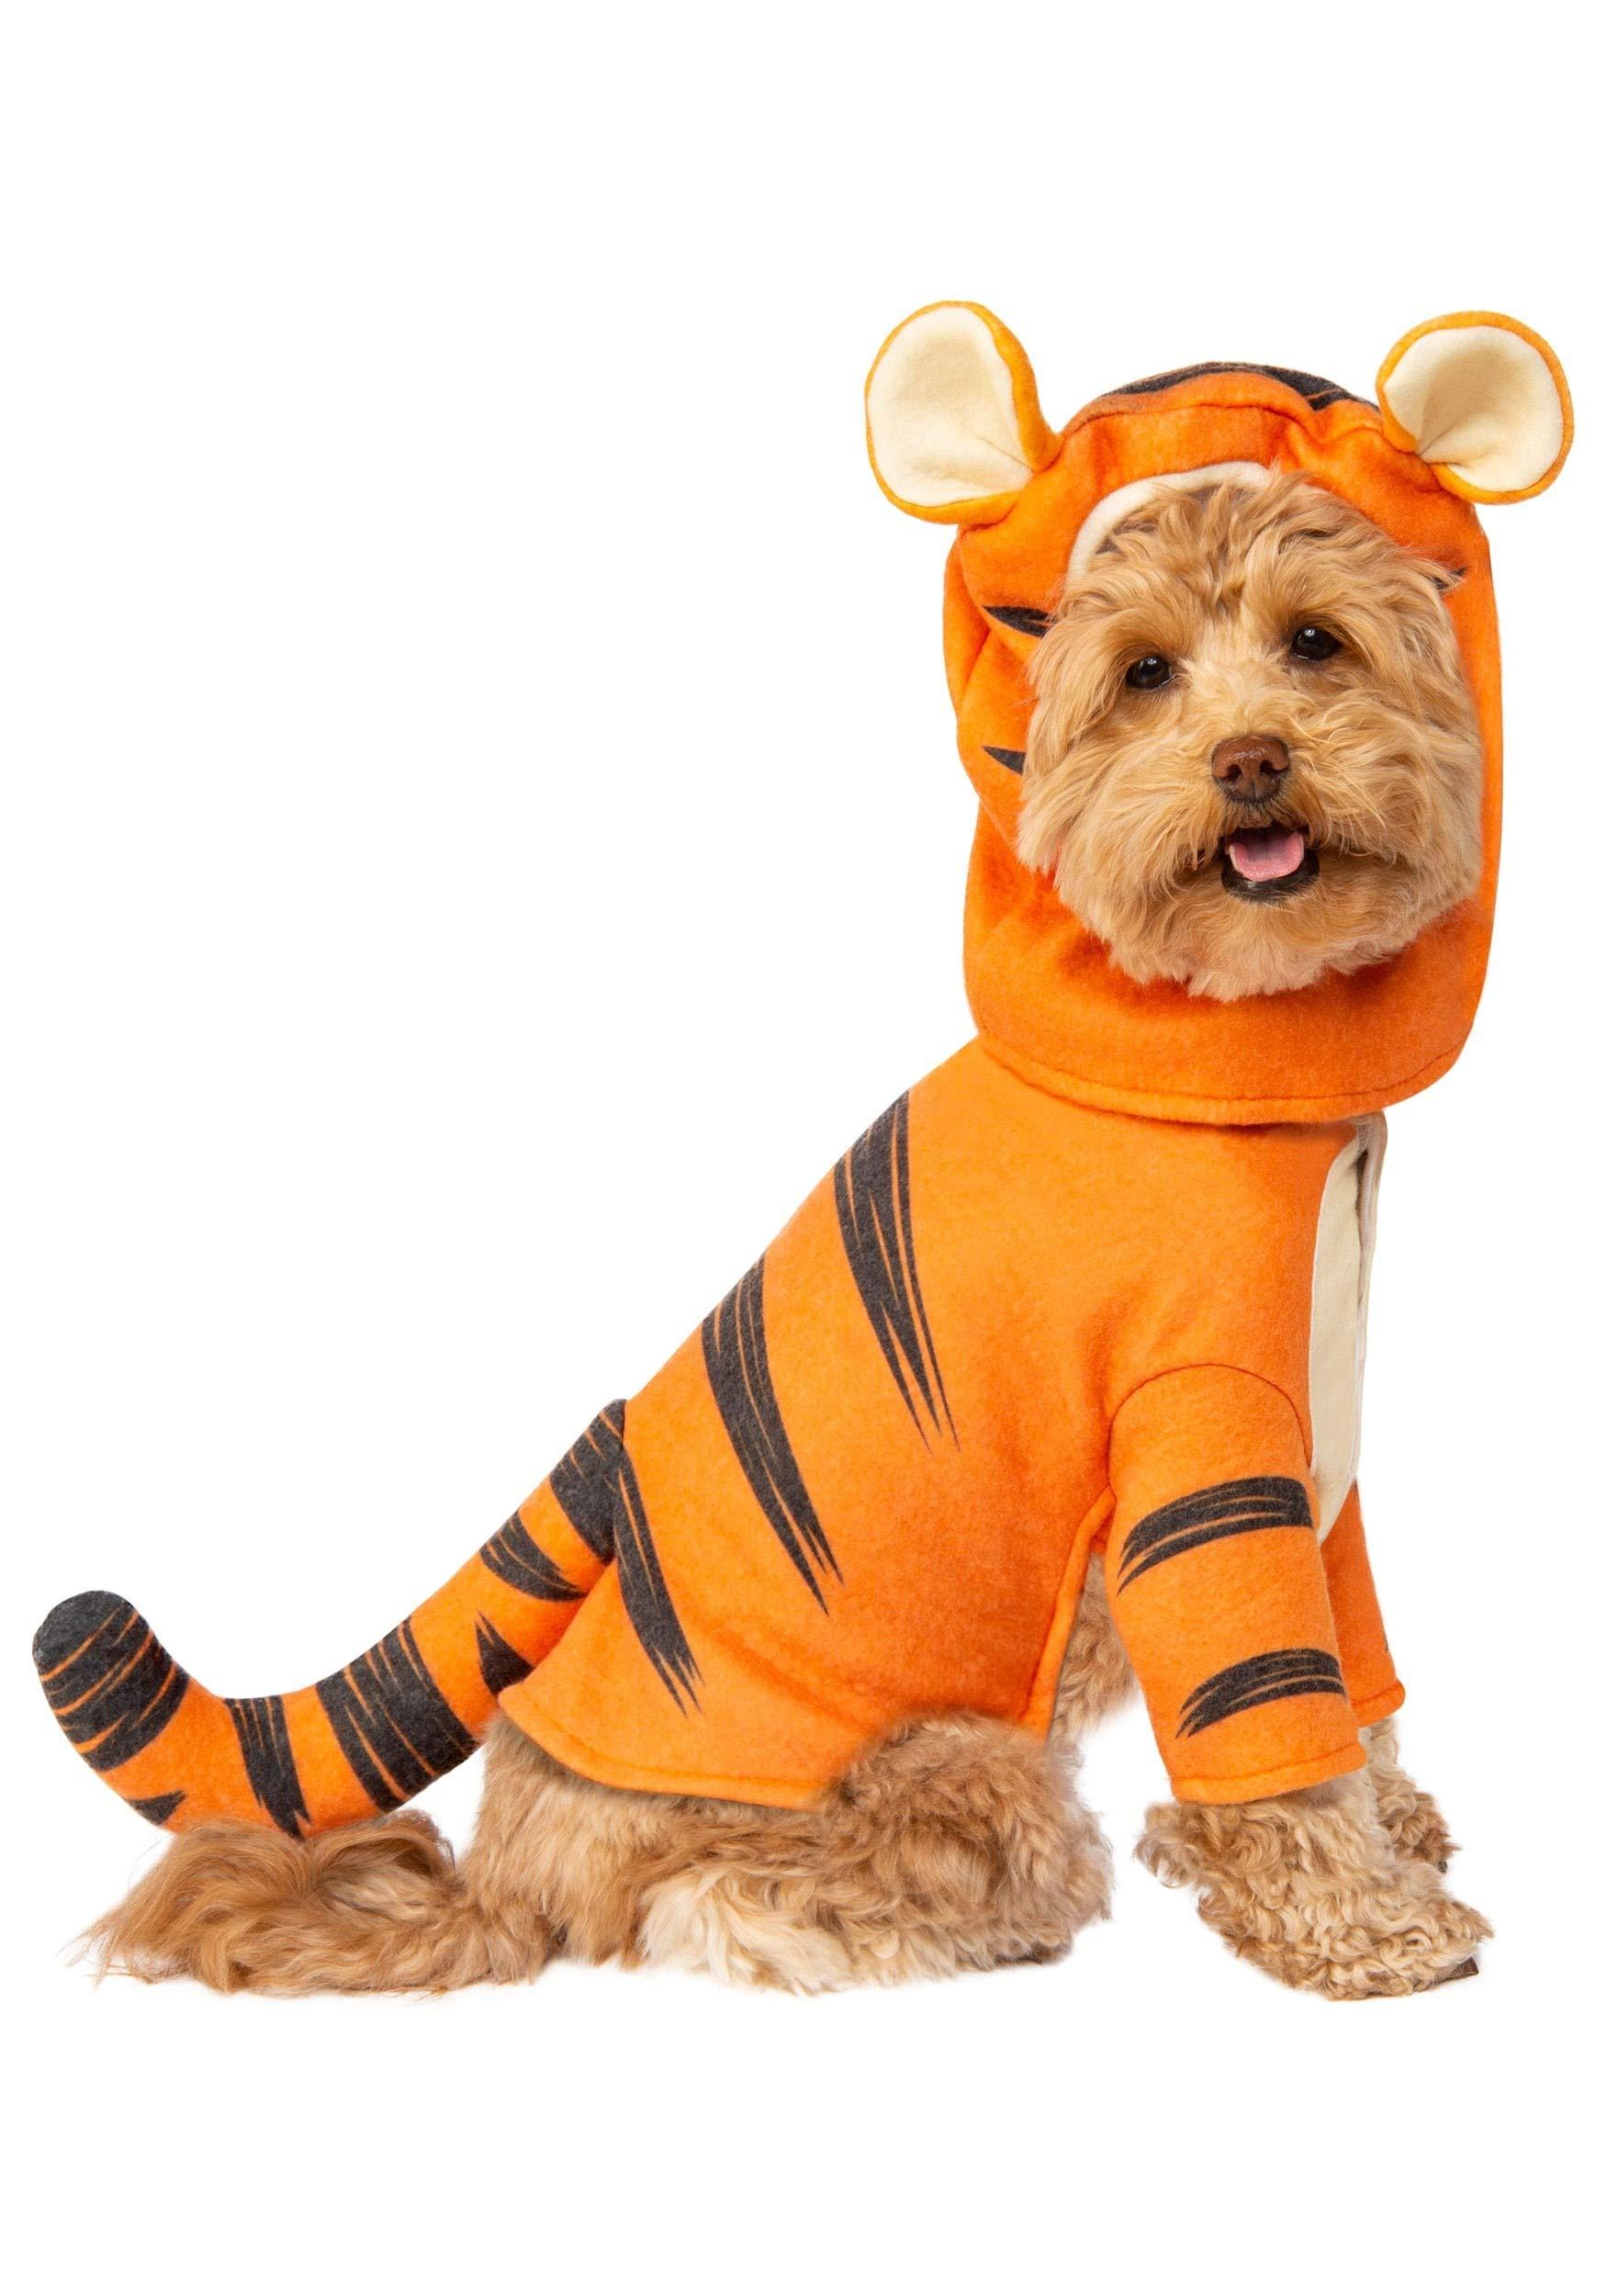 Rubie's Disney: Winnie the Pooh Pet Costume, Tigger, X-Large by Rubie's